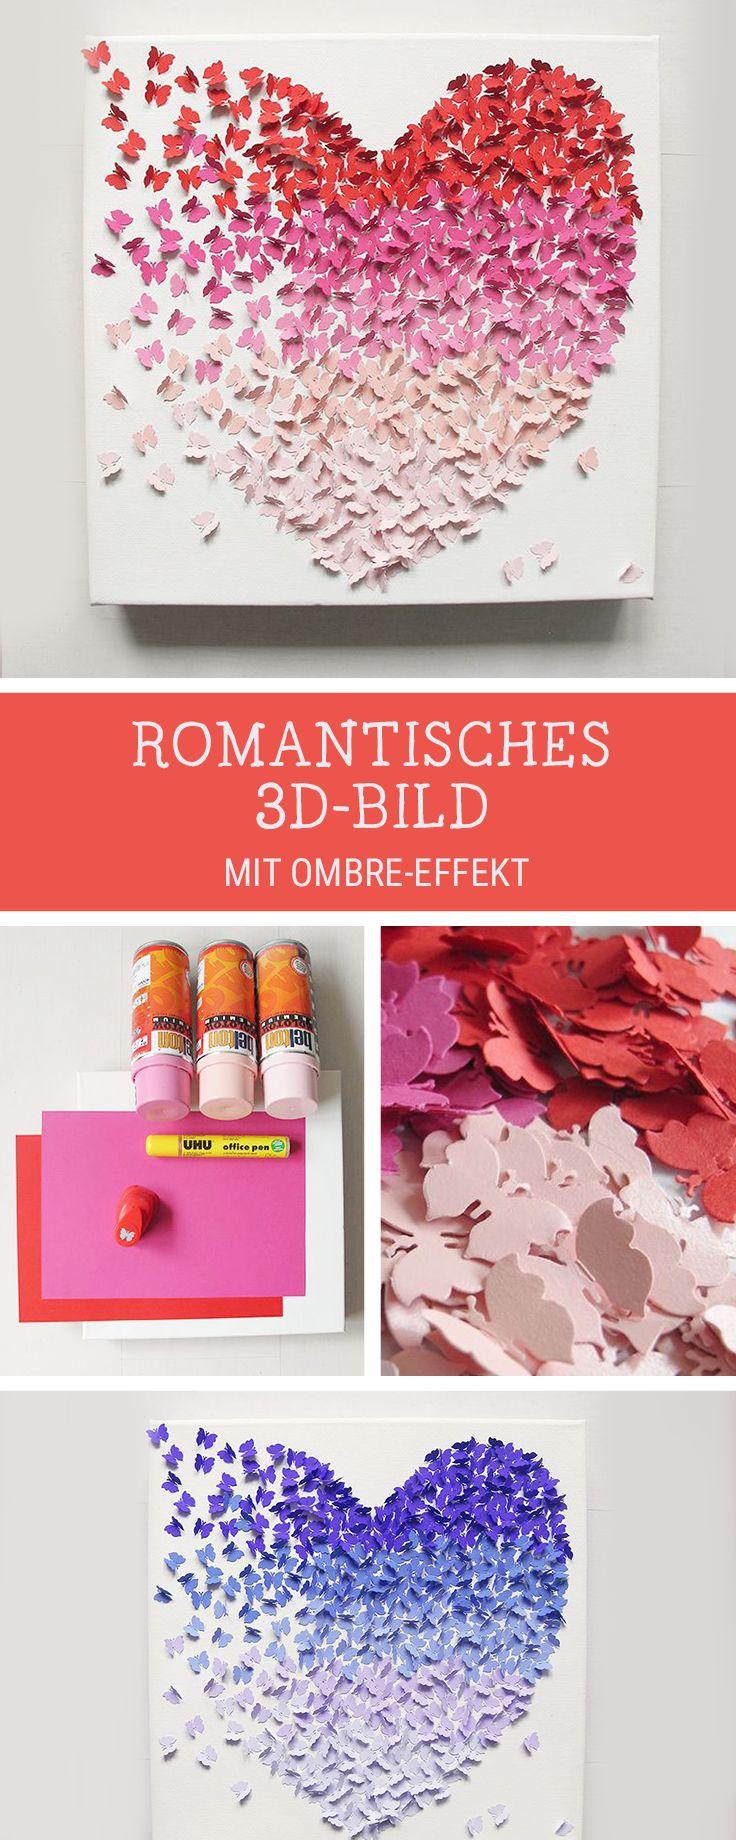 Romantisches 3D-Bild selbermachen, Ombre Effekt, Herz / diy crafting idea: romantic picture with ombre butterflies via DaWanda.com